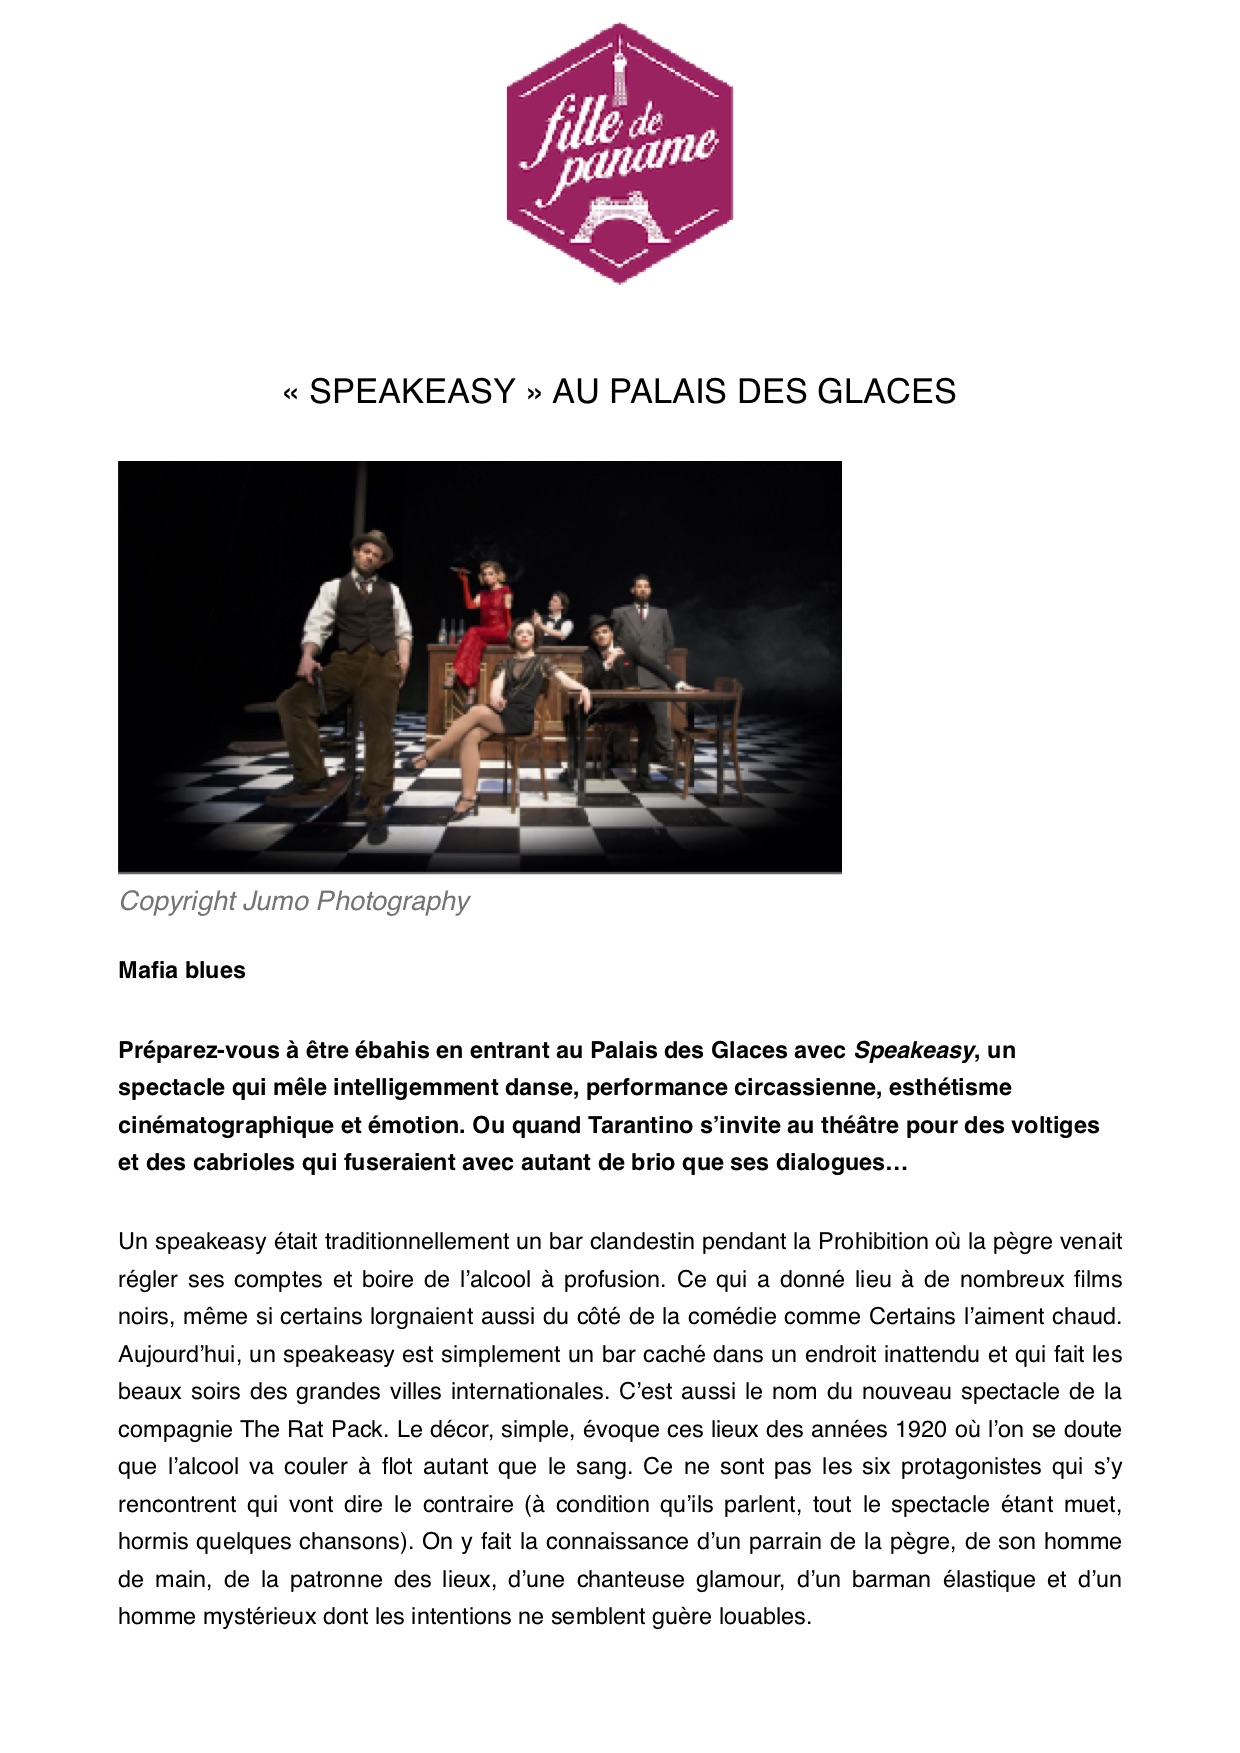 FillesdePaname p1-02.07.18